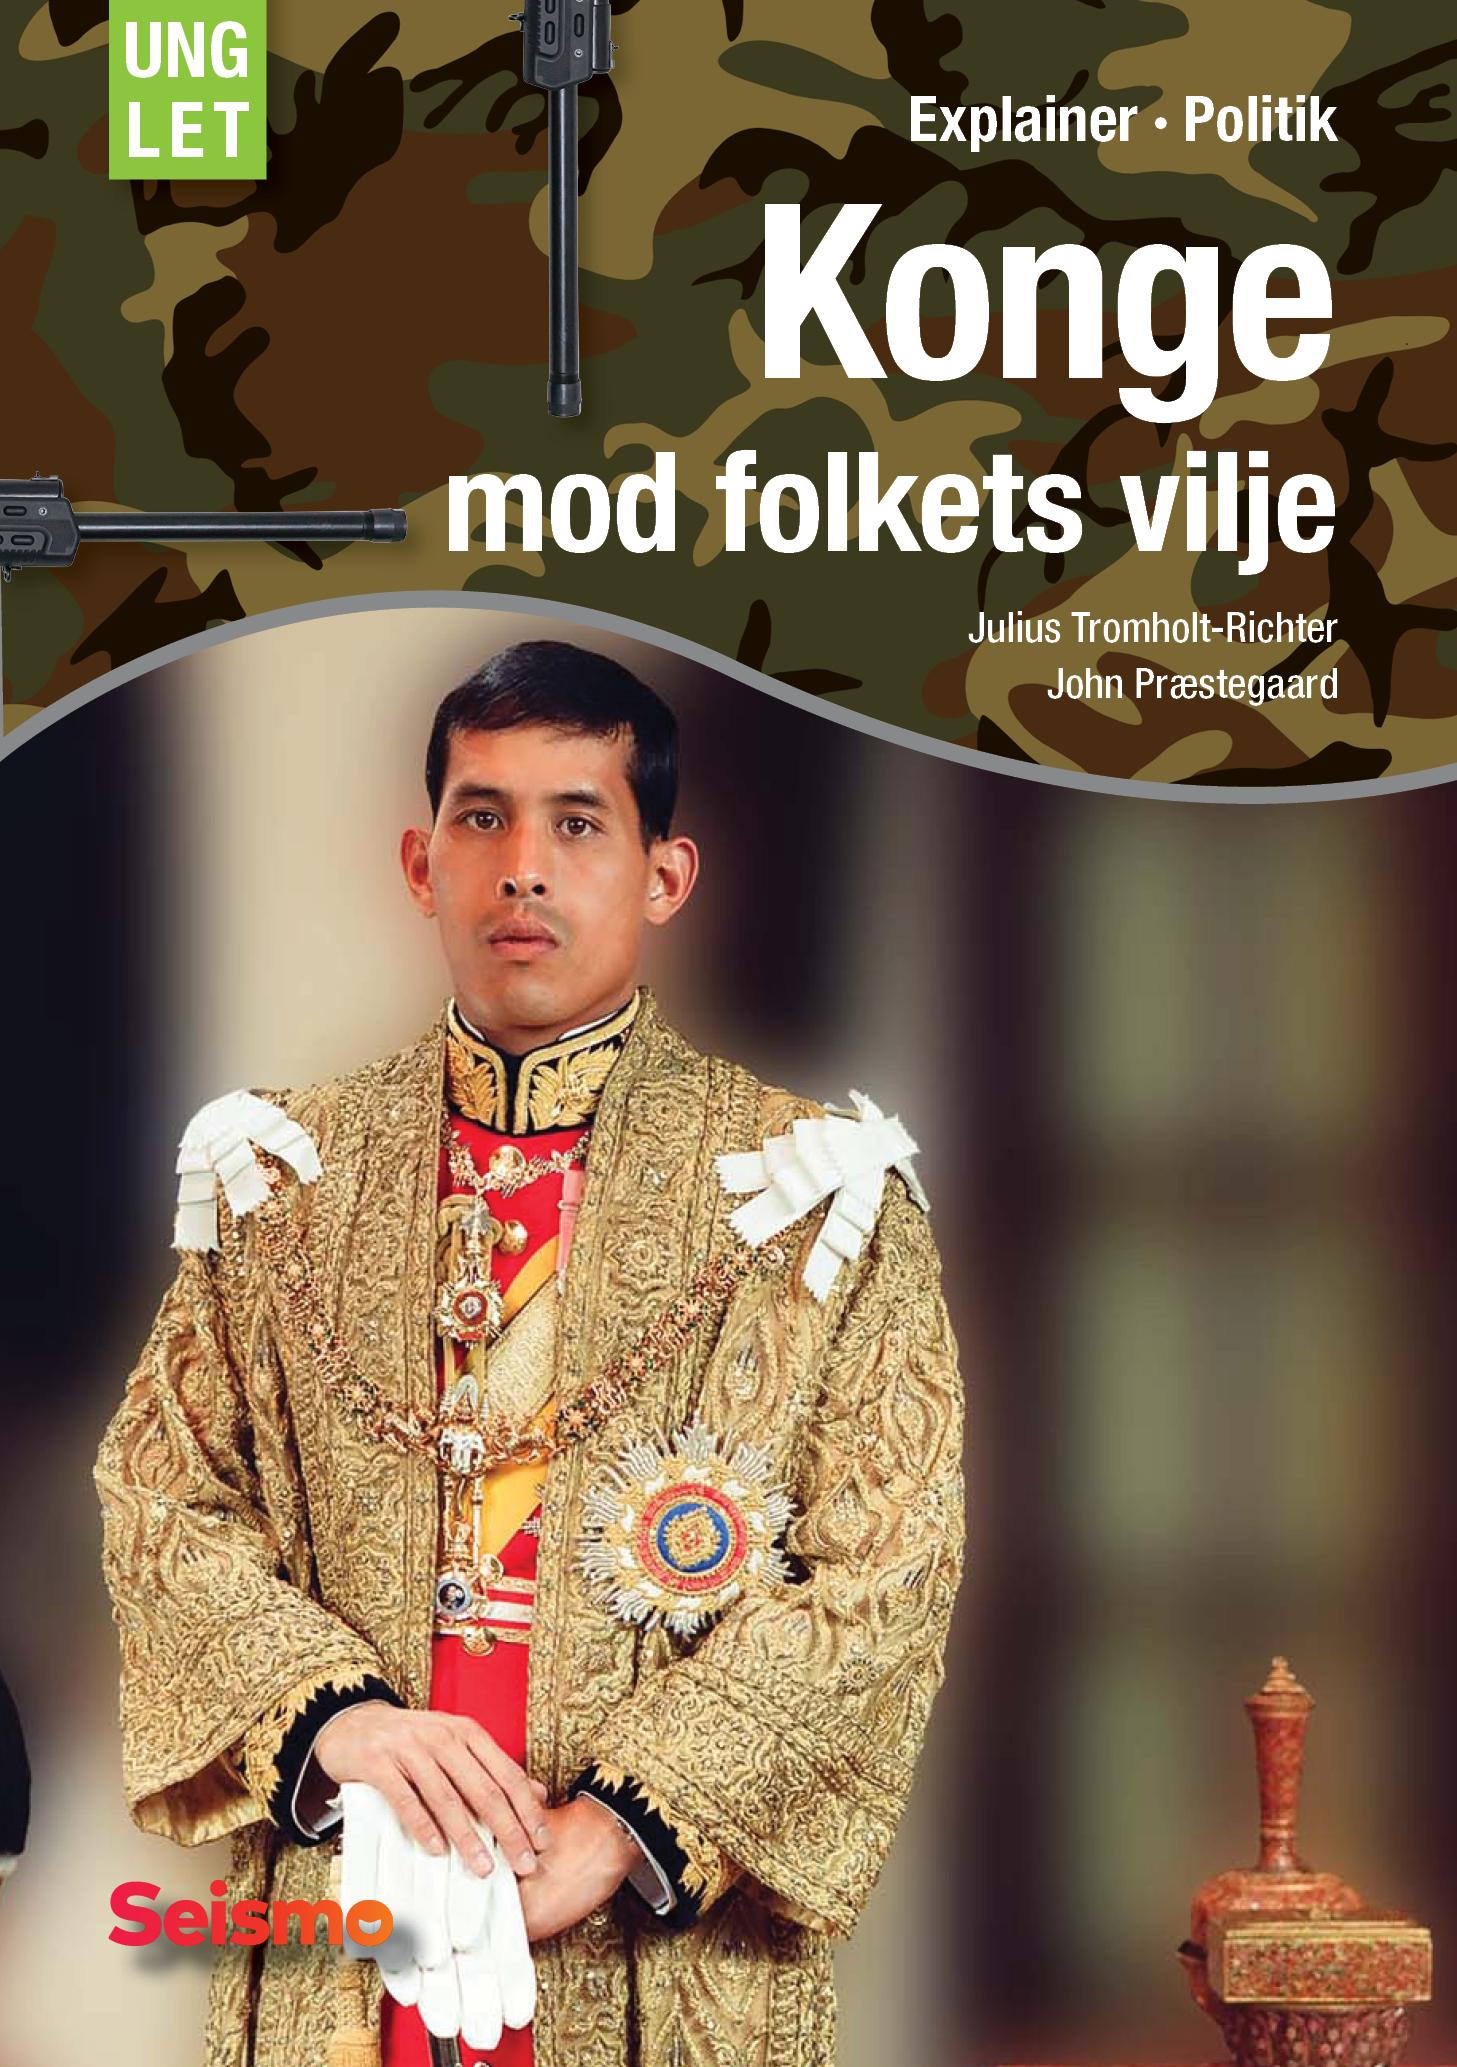 Konge mod folkets vilje